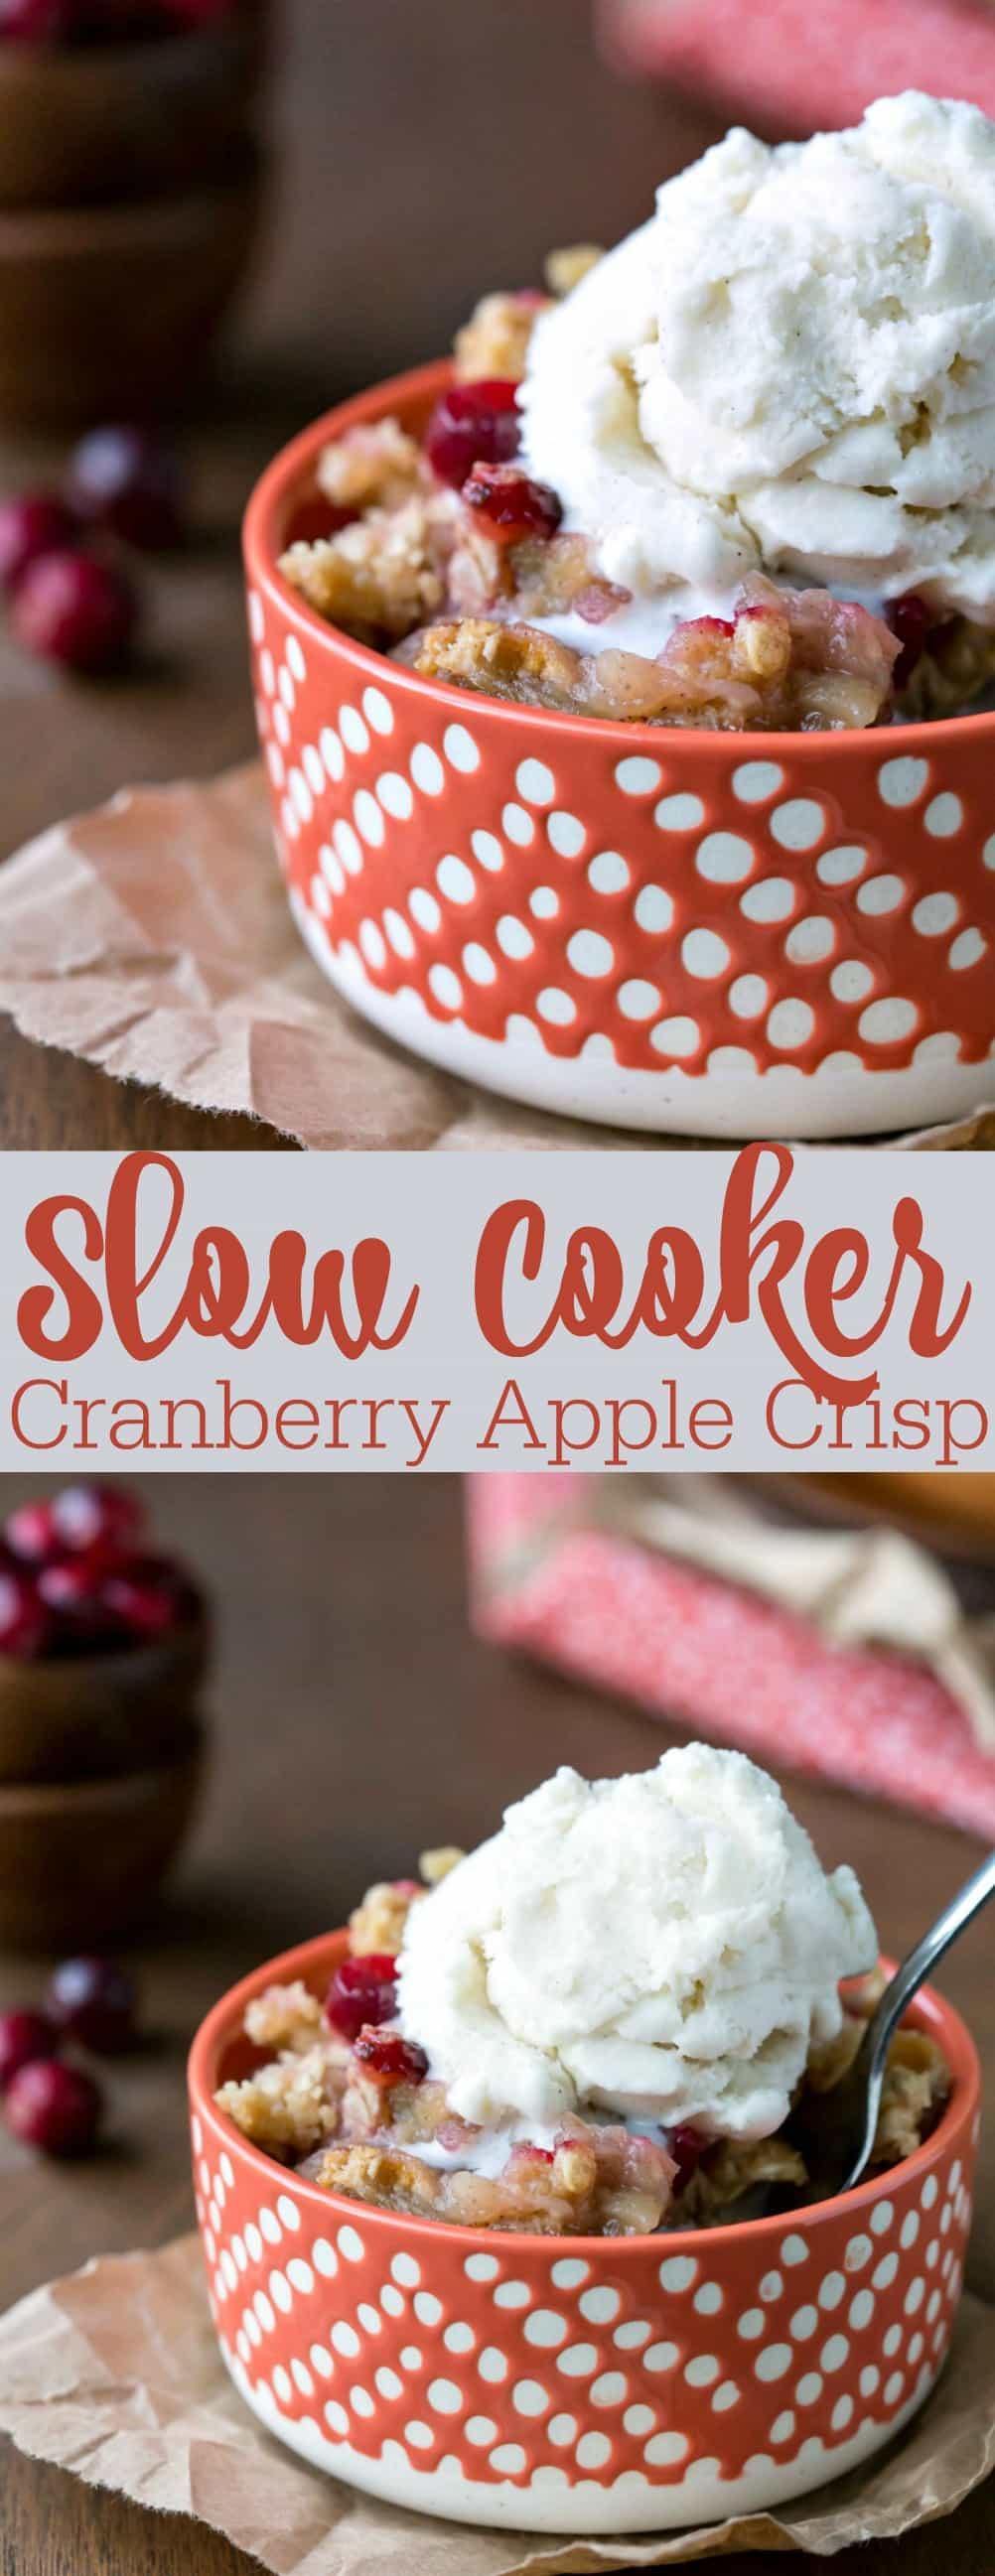 Slow Cooker Cranberry Apple Crisp